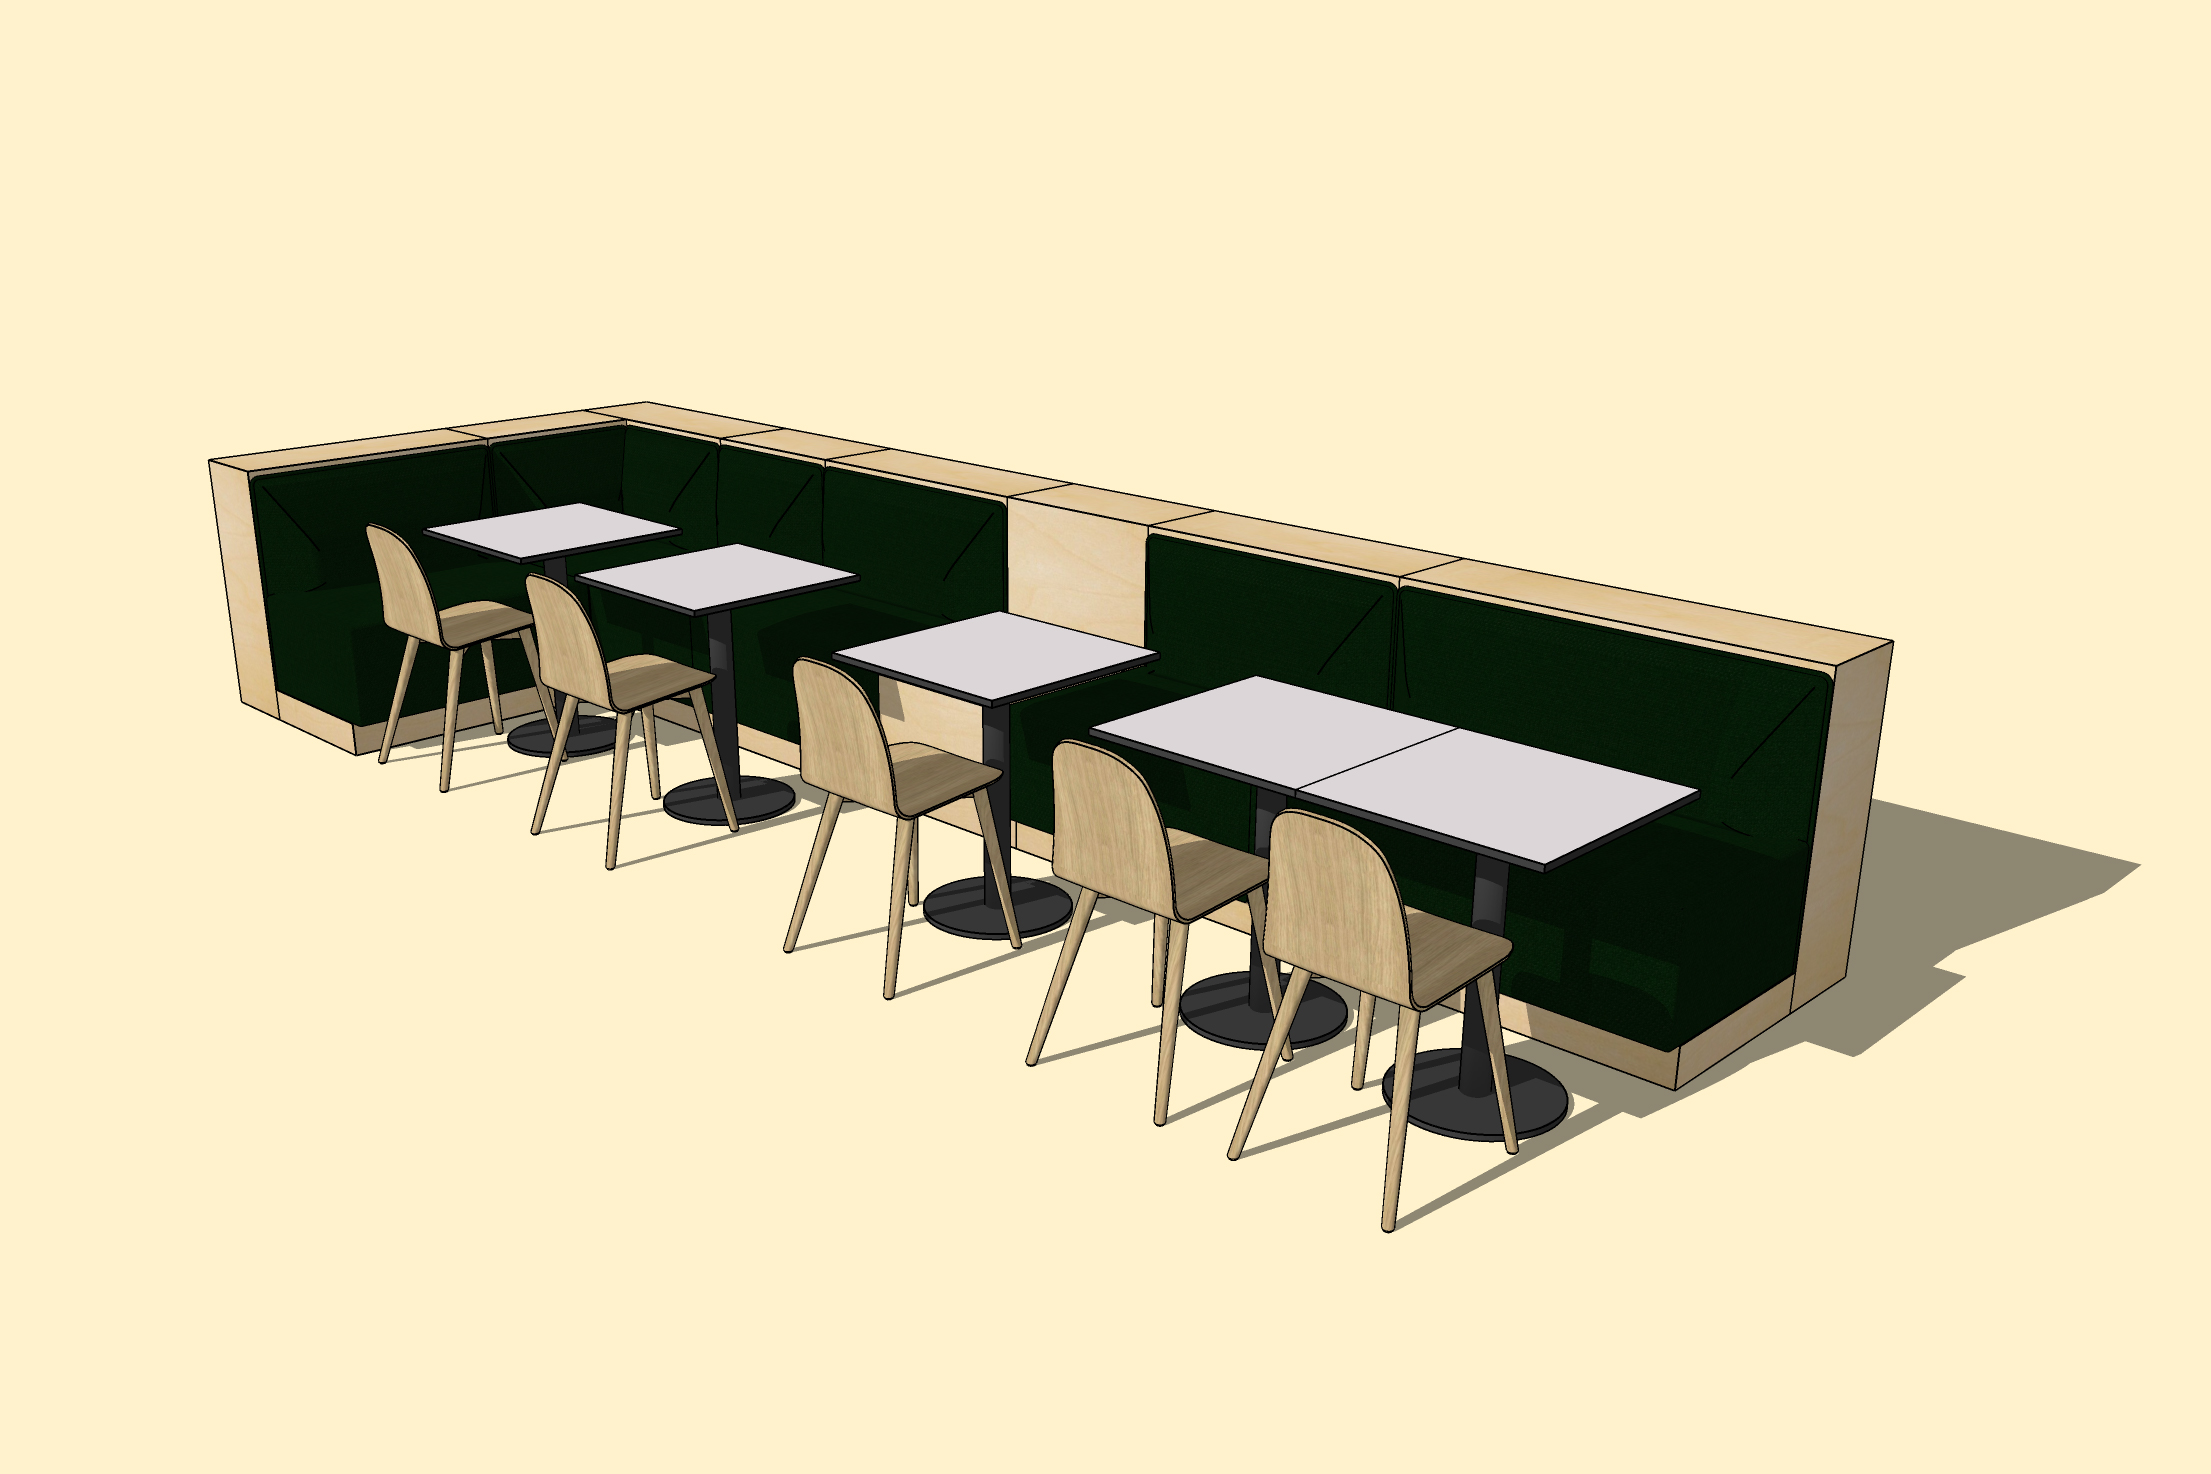 Bank seating system